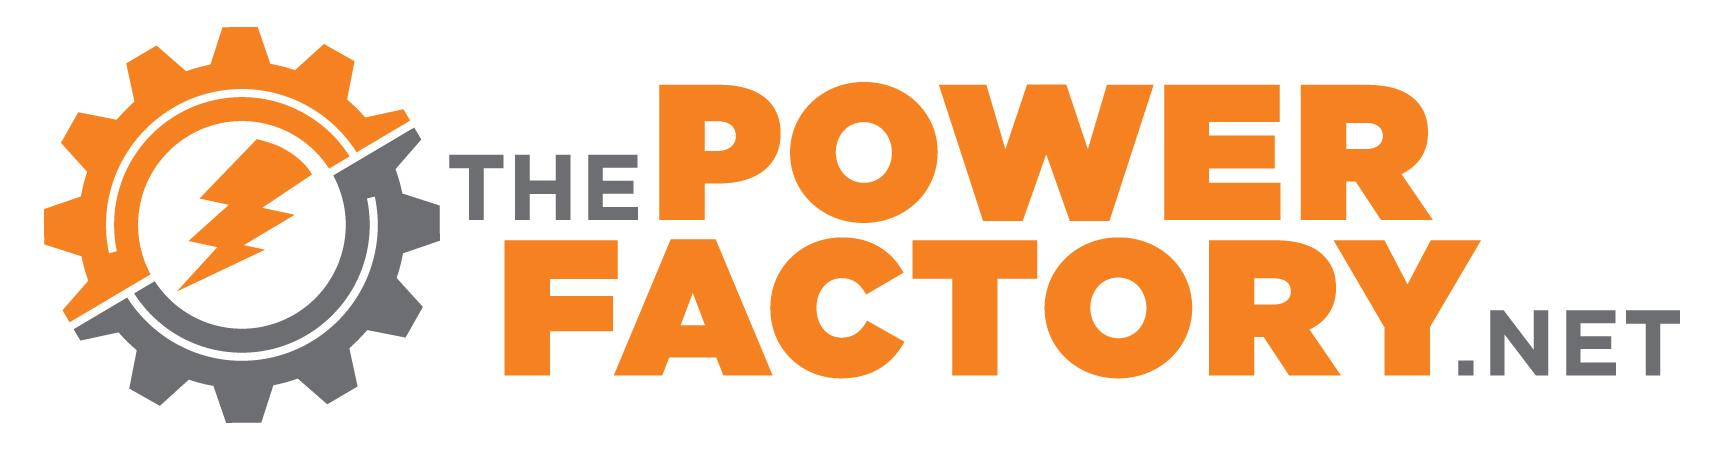 The Power Factory Ltd.